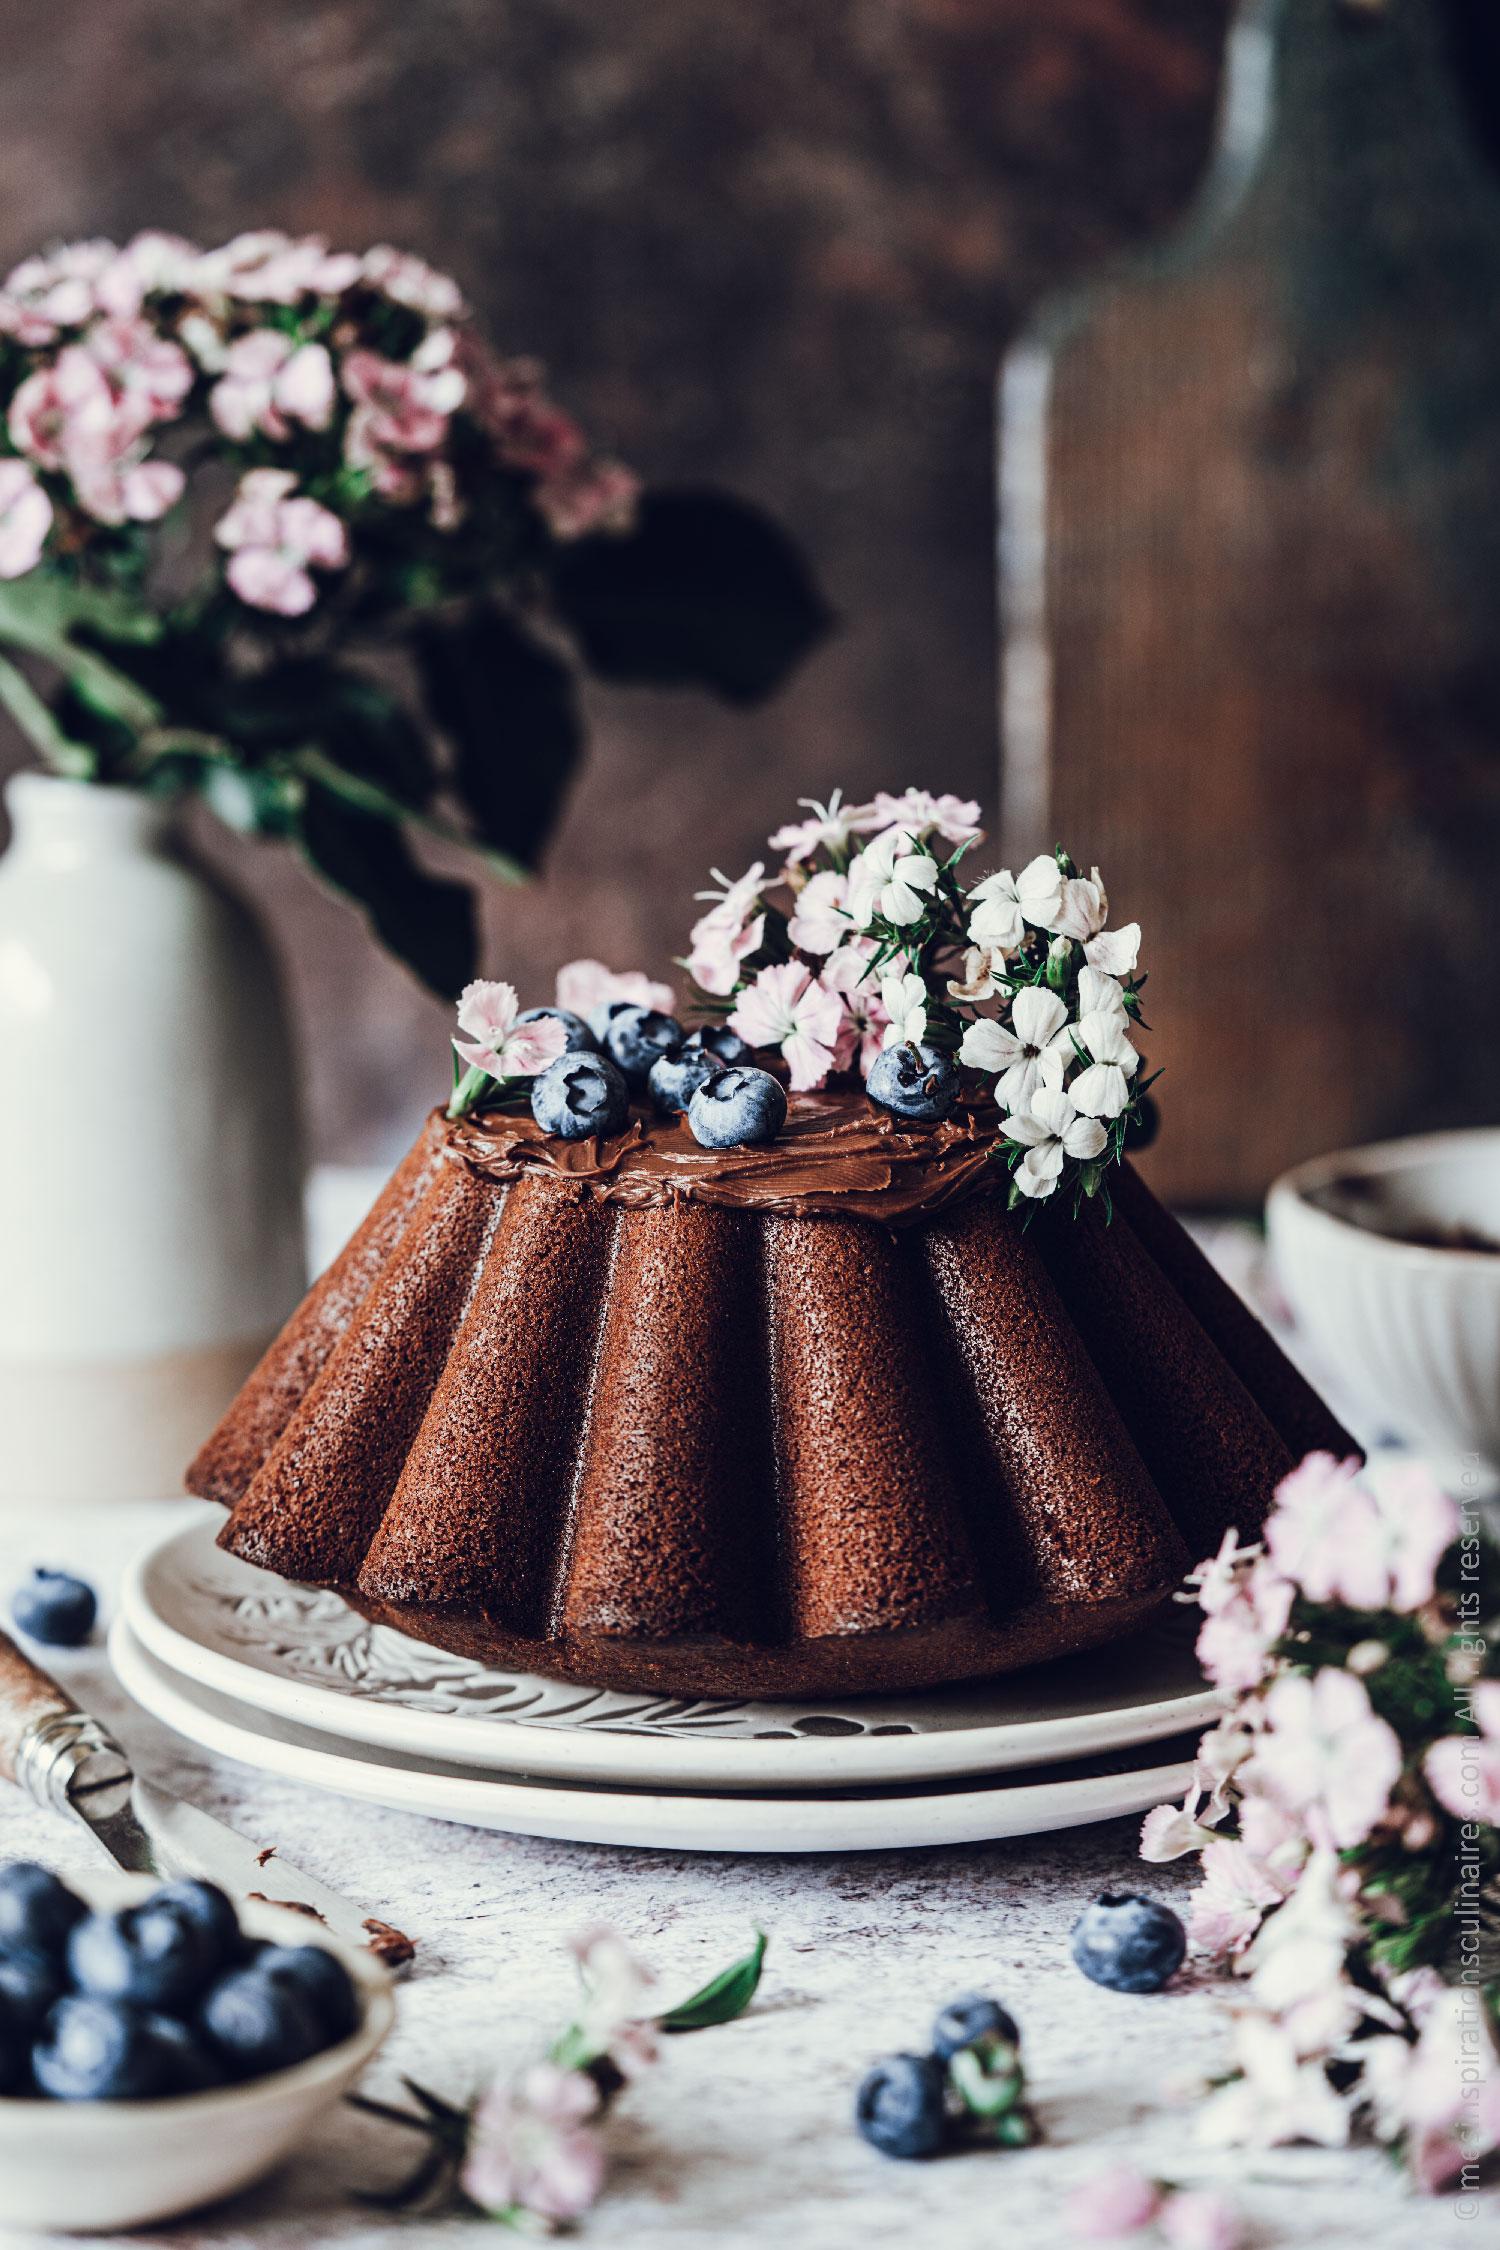 sponge cake au chocolat au lait chaud